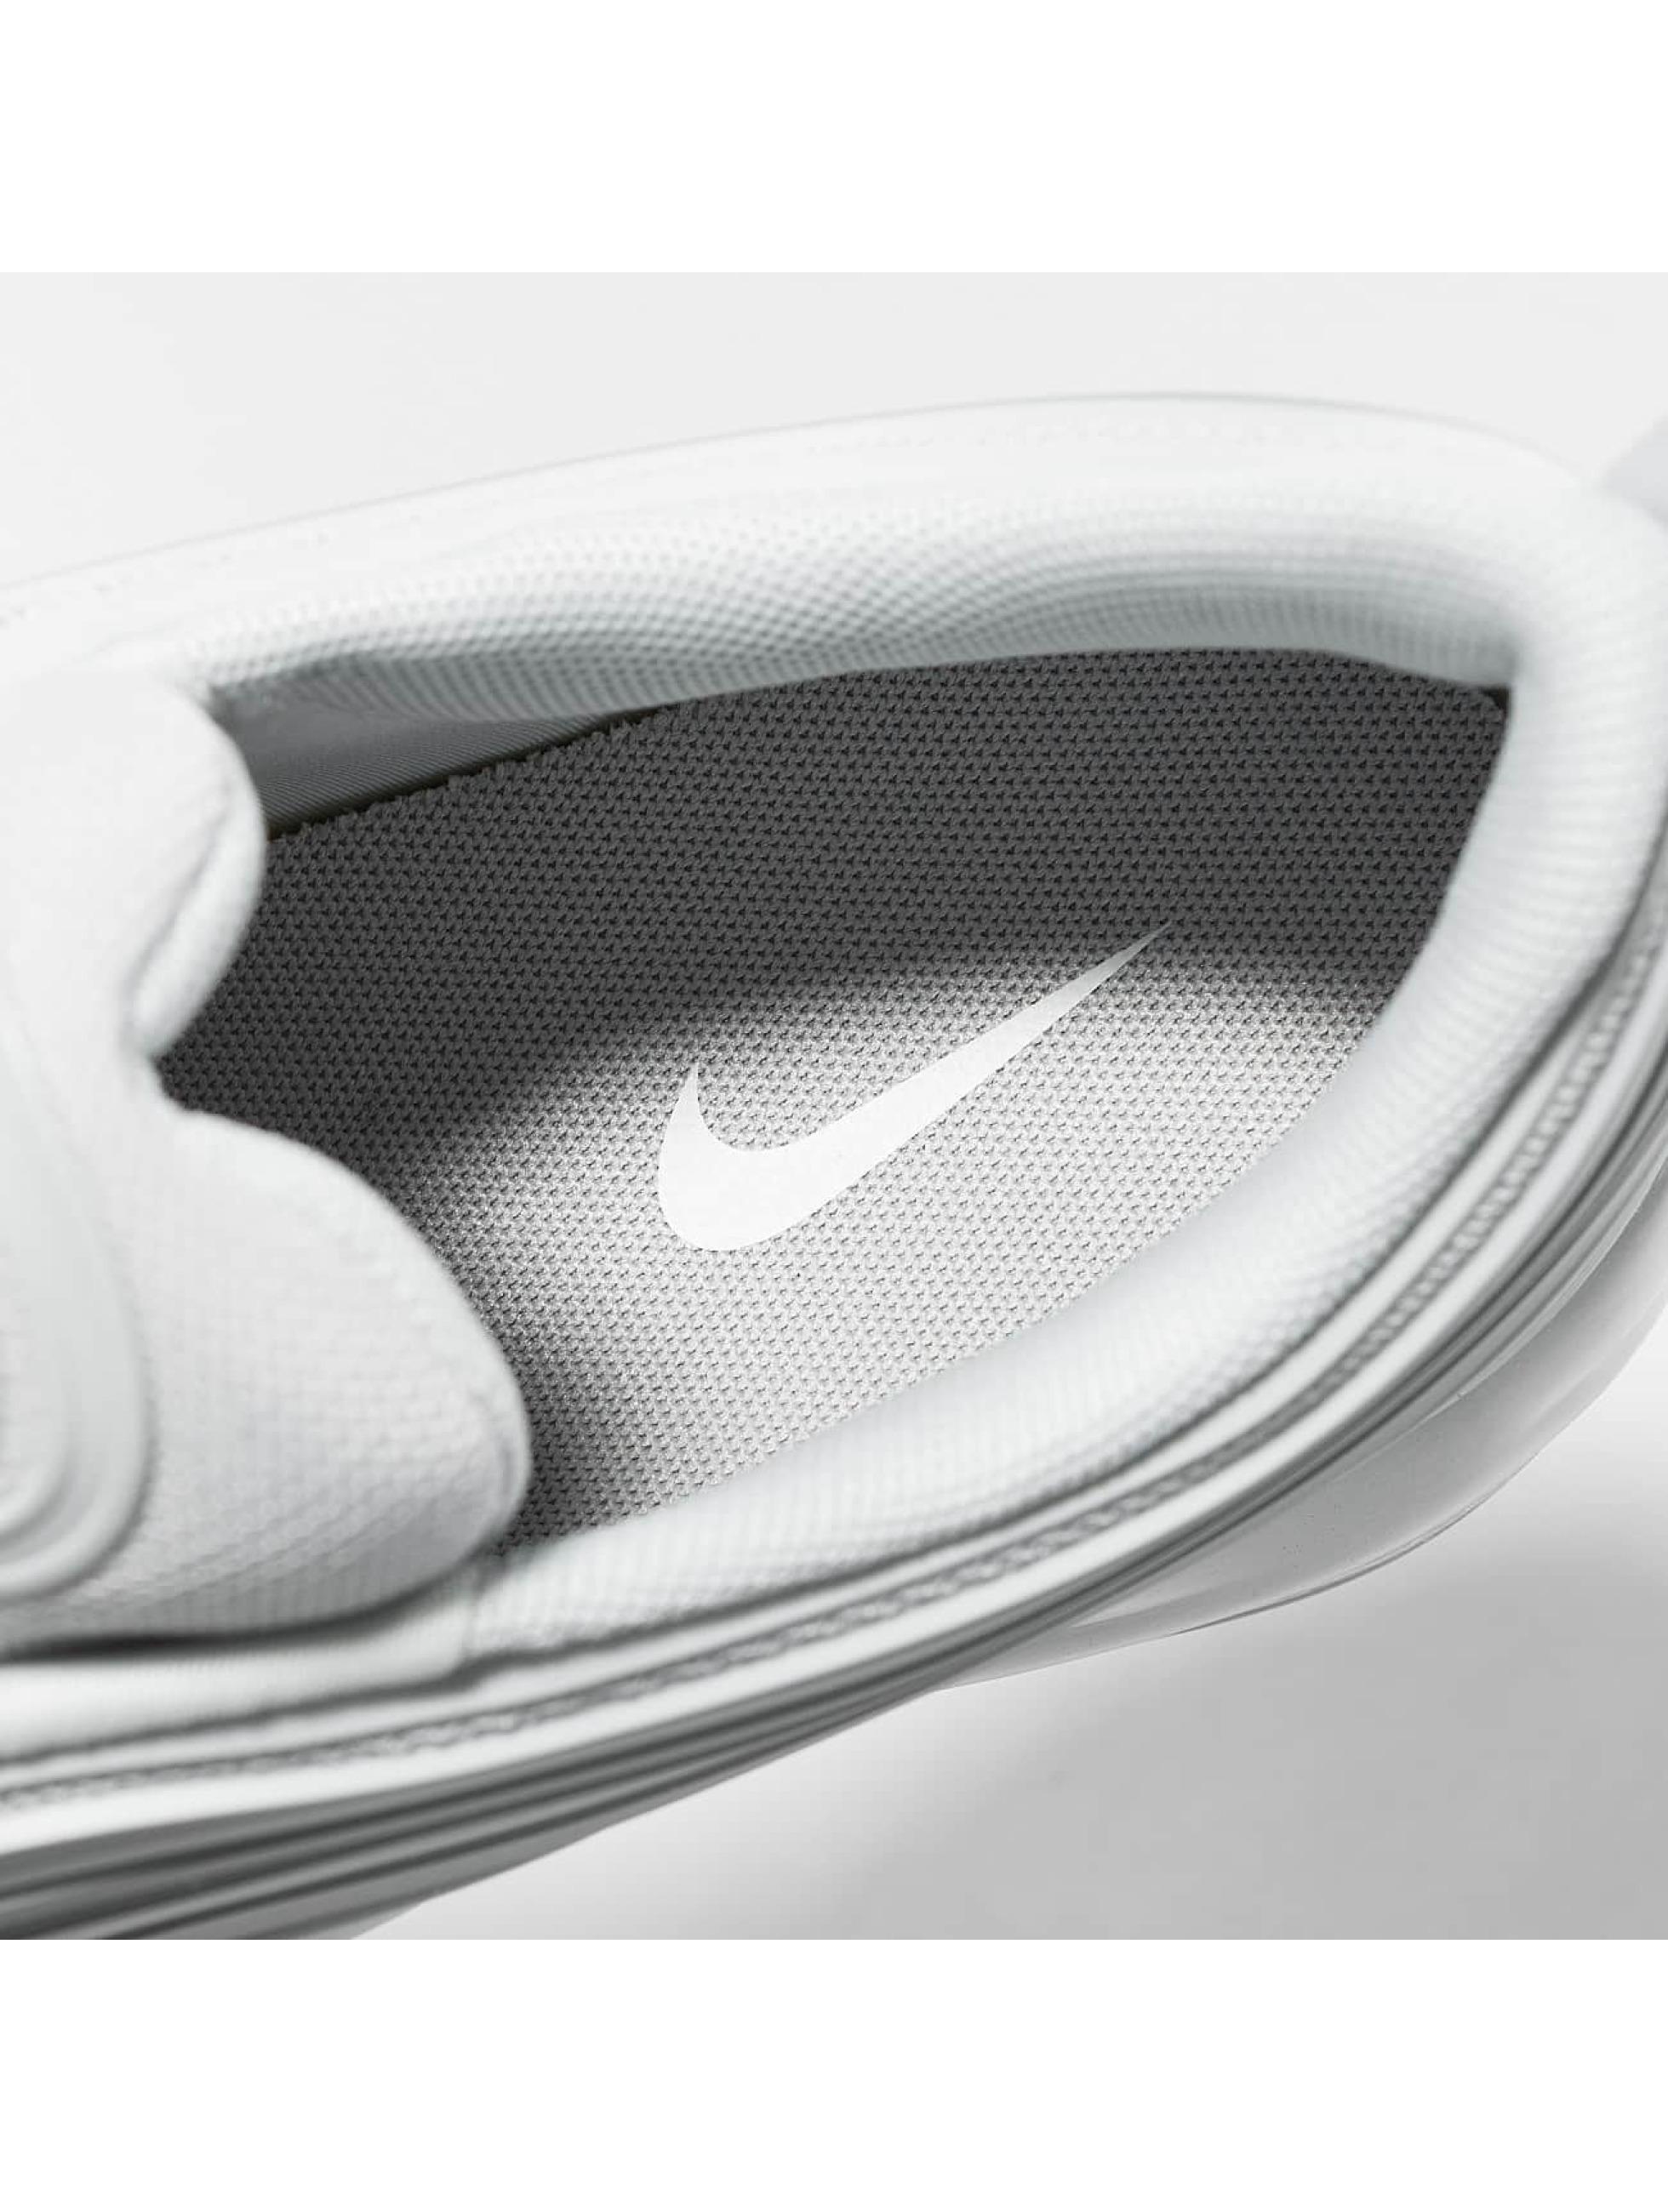 Nike Zapatillas de deporte Air Max 97 Ultra '17 Premium gris